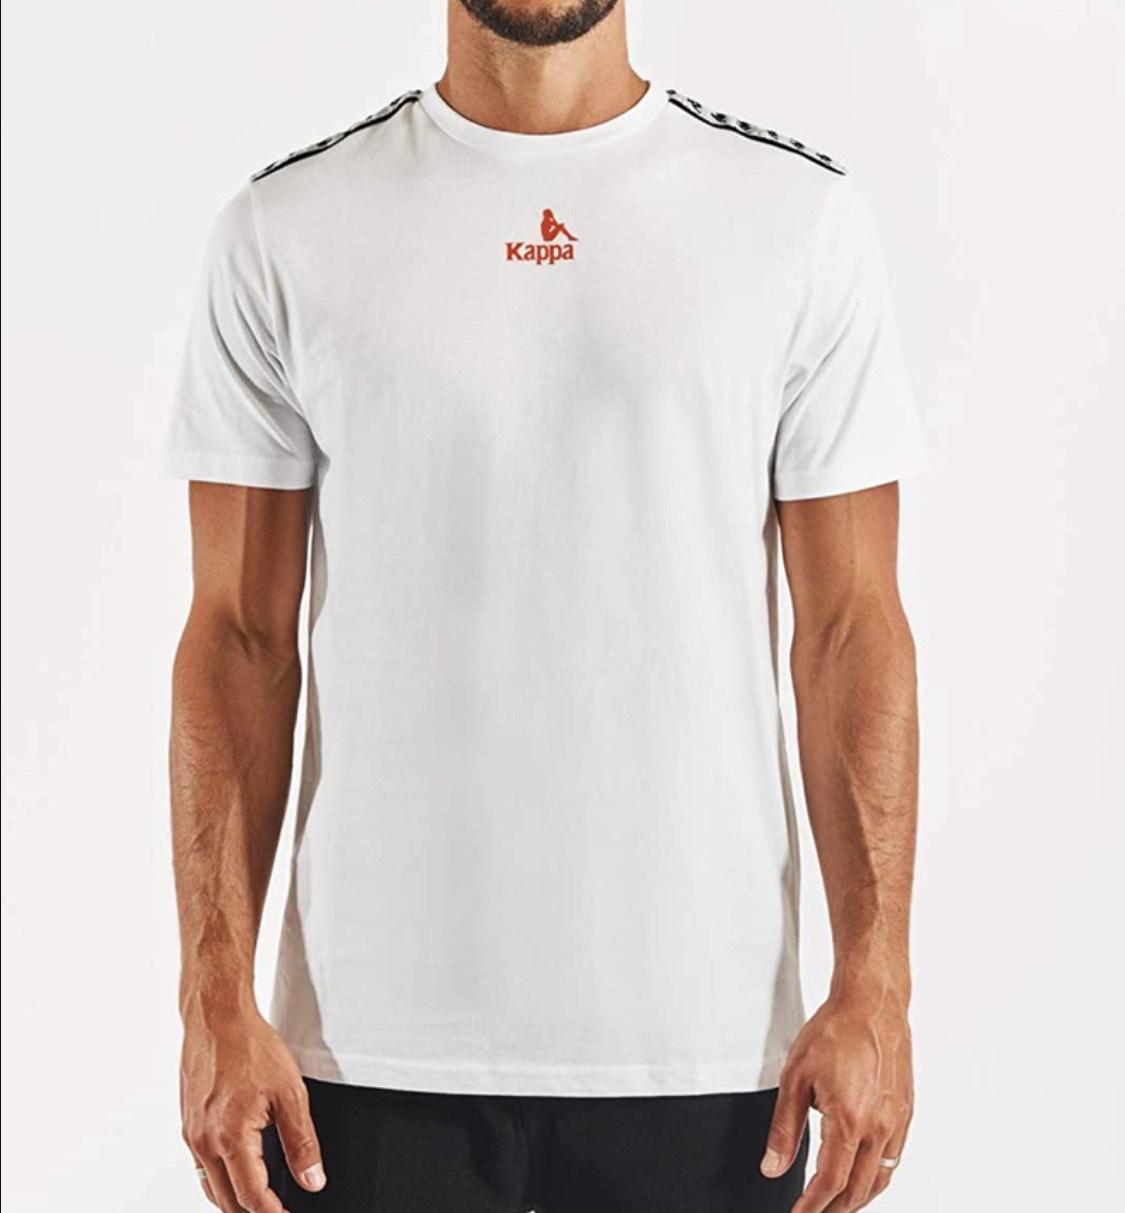 Camiseta algodón Kappa adulto talla S.